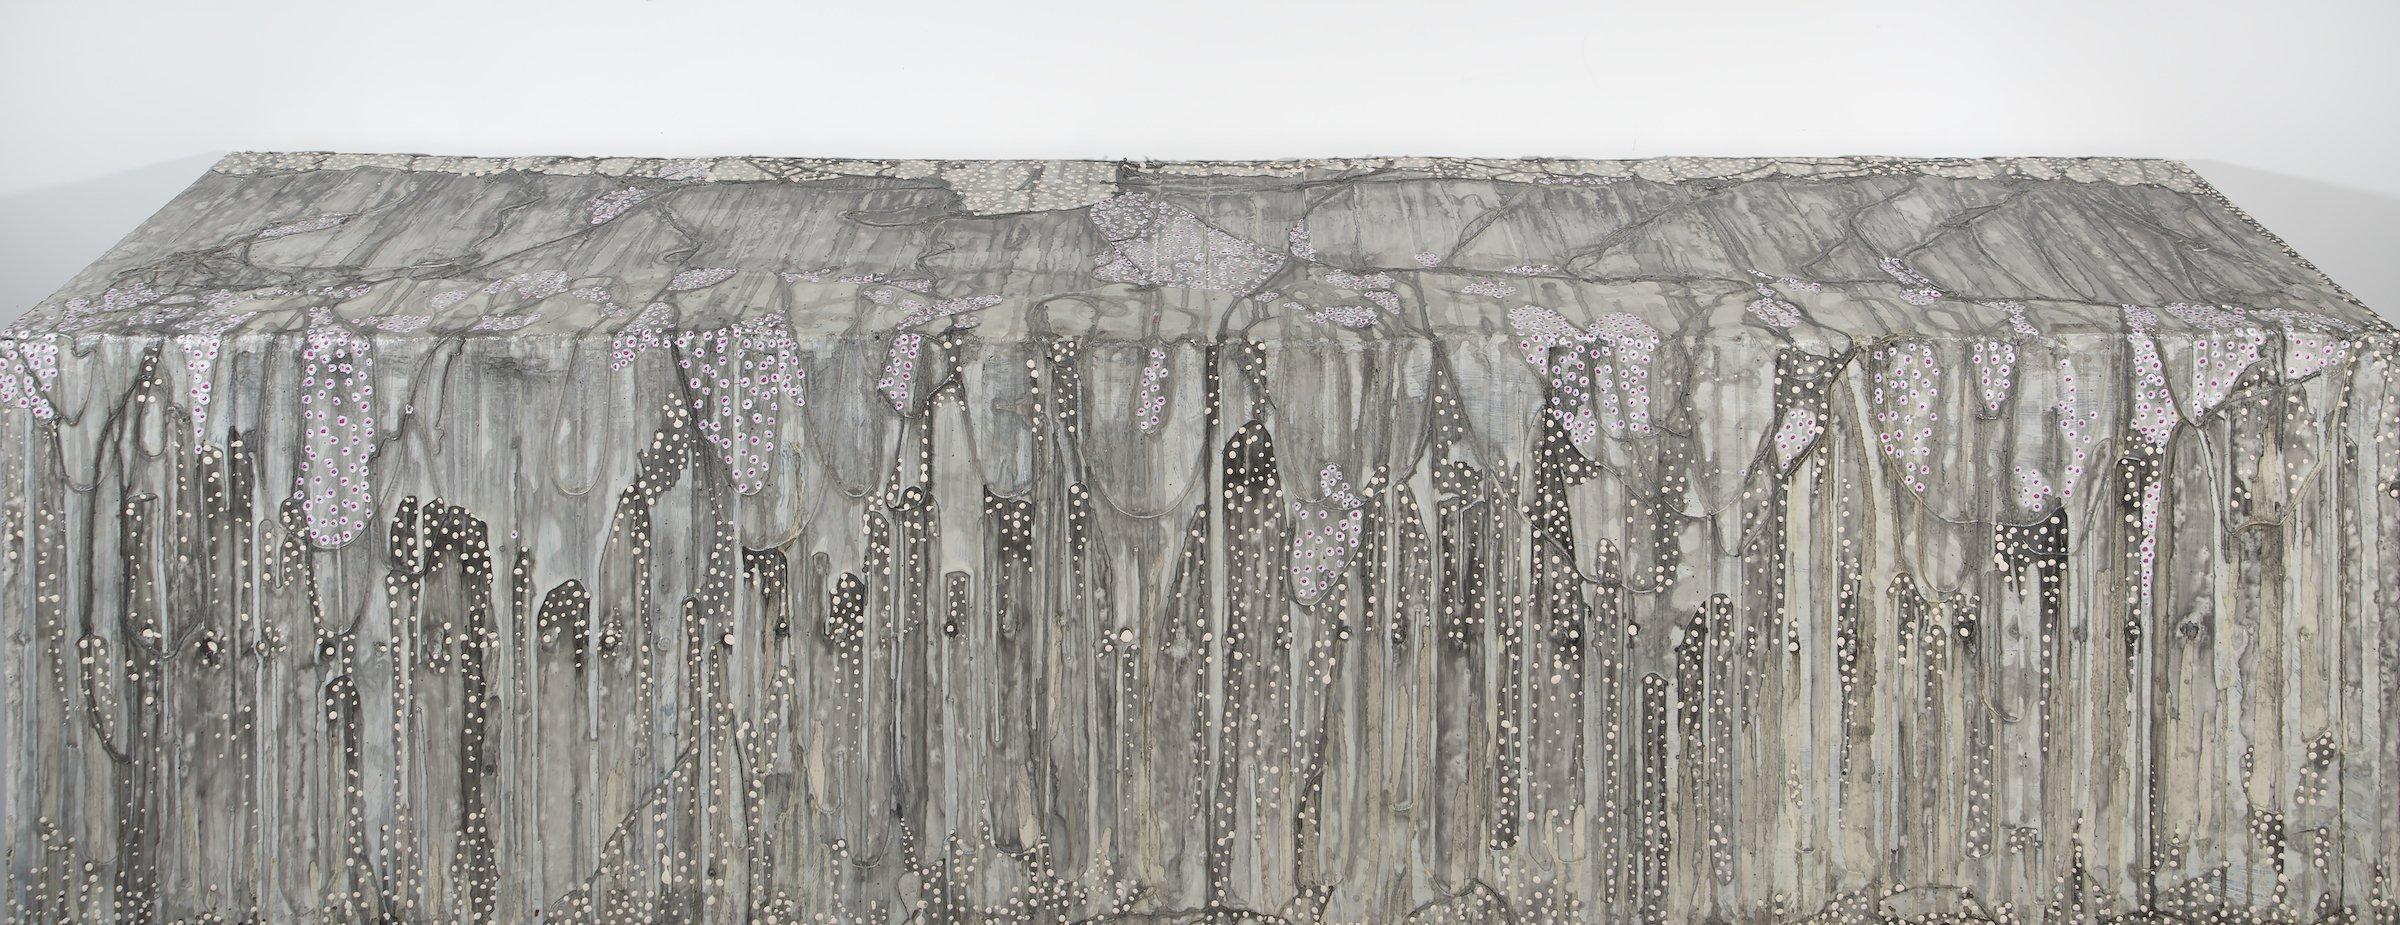 """Cornerpiece"" by Antonio Puri, 16""x12""x60"" Mixed Media on Canvas, 2014, Mud Season Review"